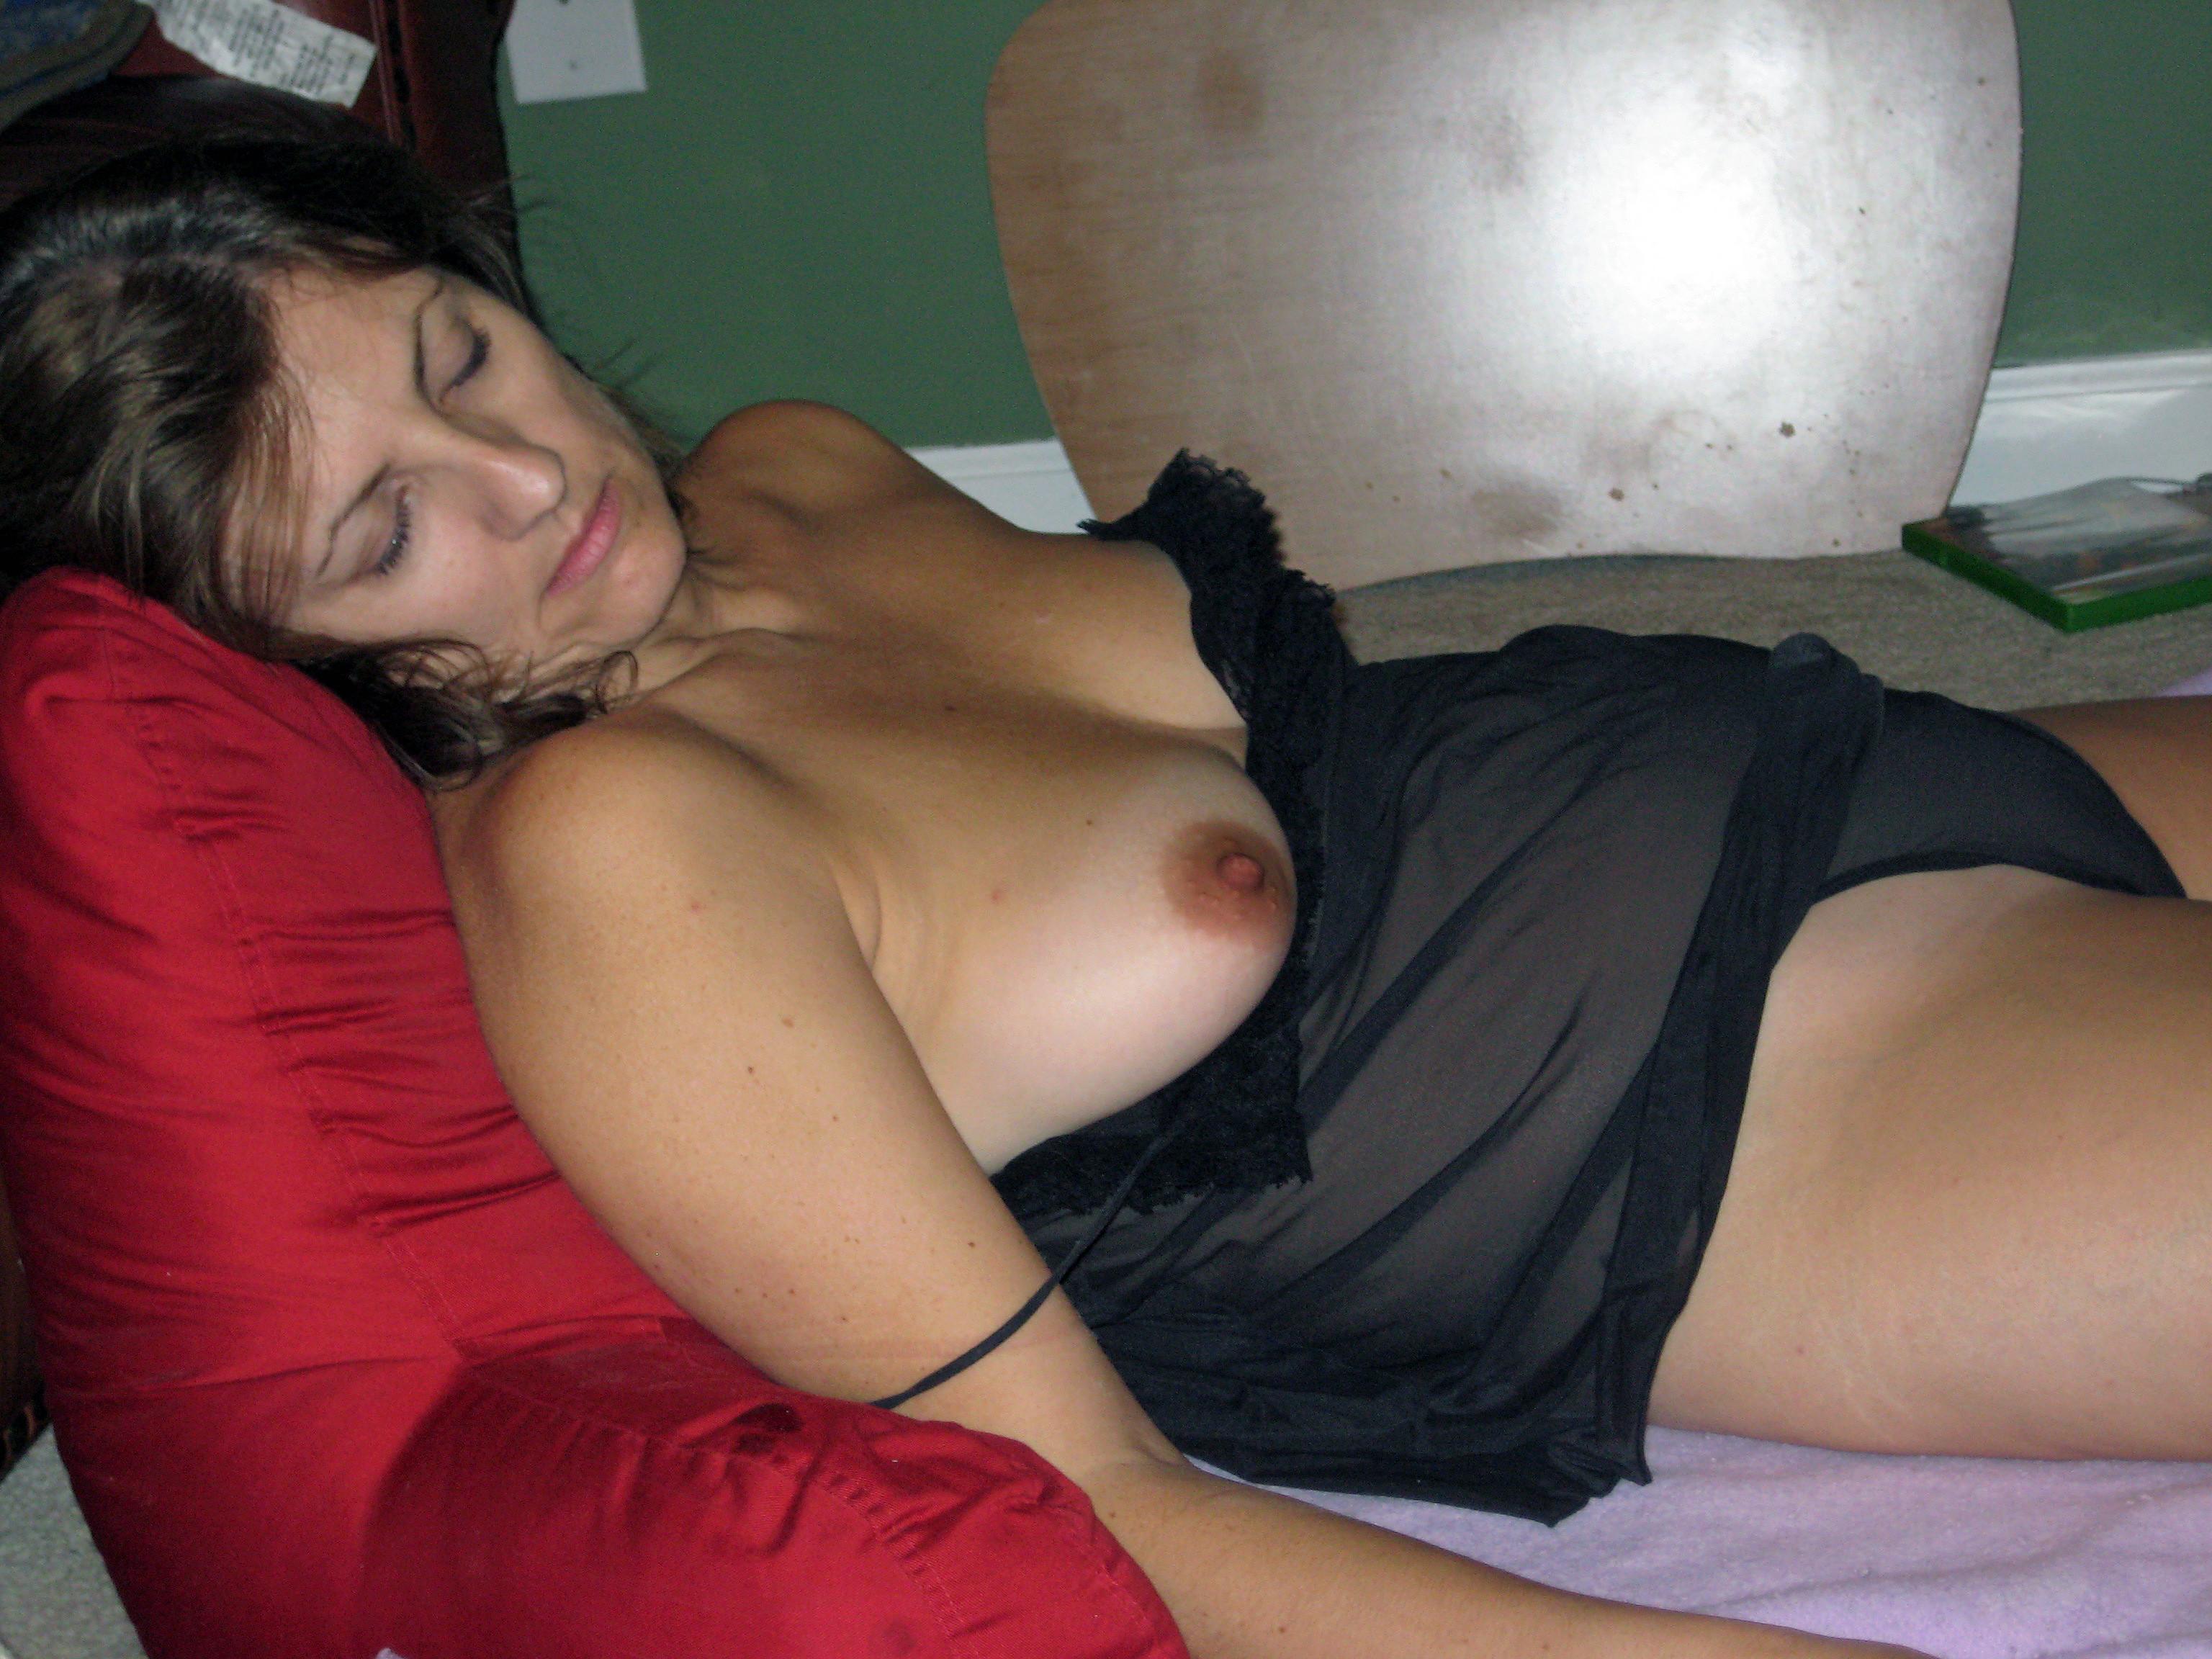 huge-tits-mature-nude-sleeping-carmella-bing-armpit-fuck